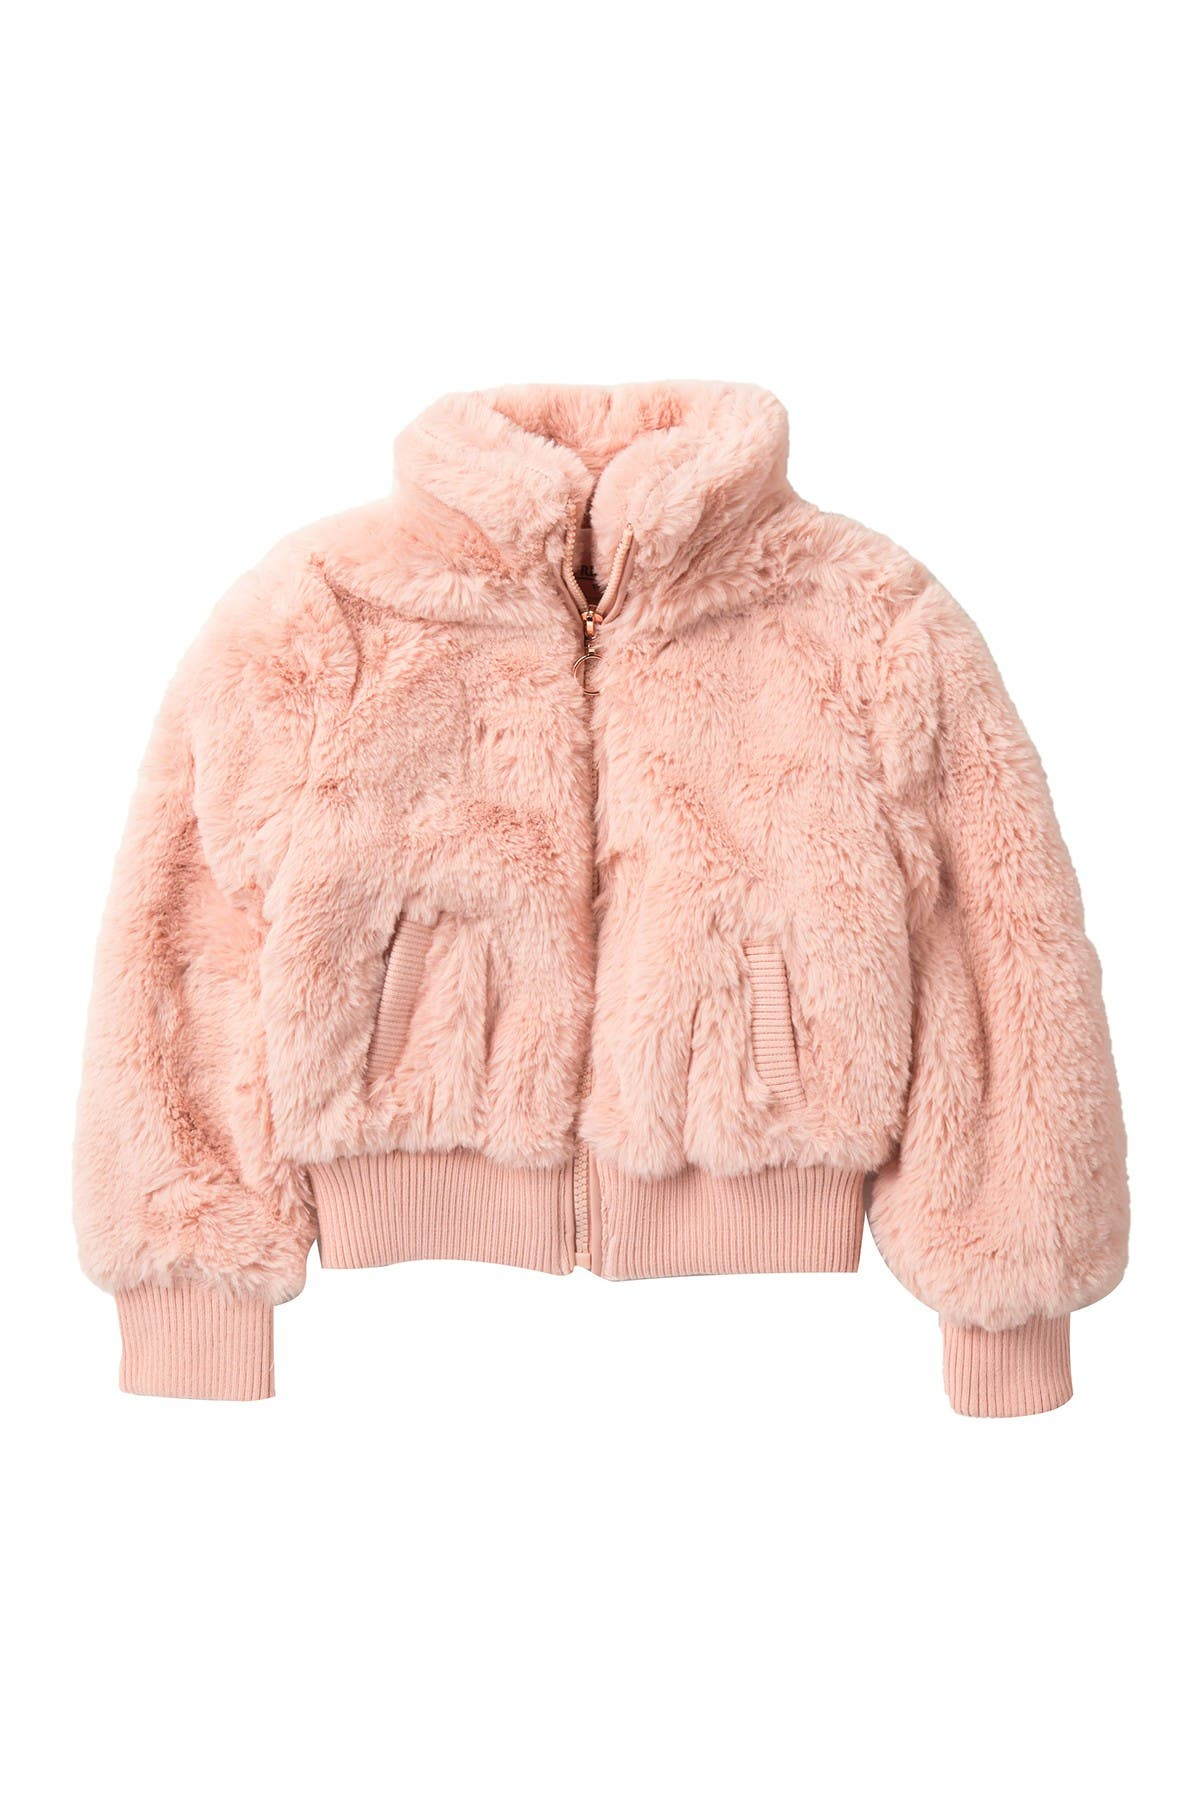 Image of Urban Republic Faux Fur Bomber Jacket ( Little Girls)